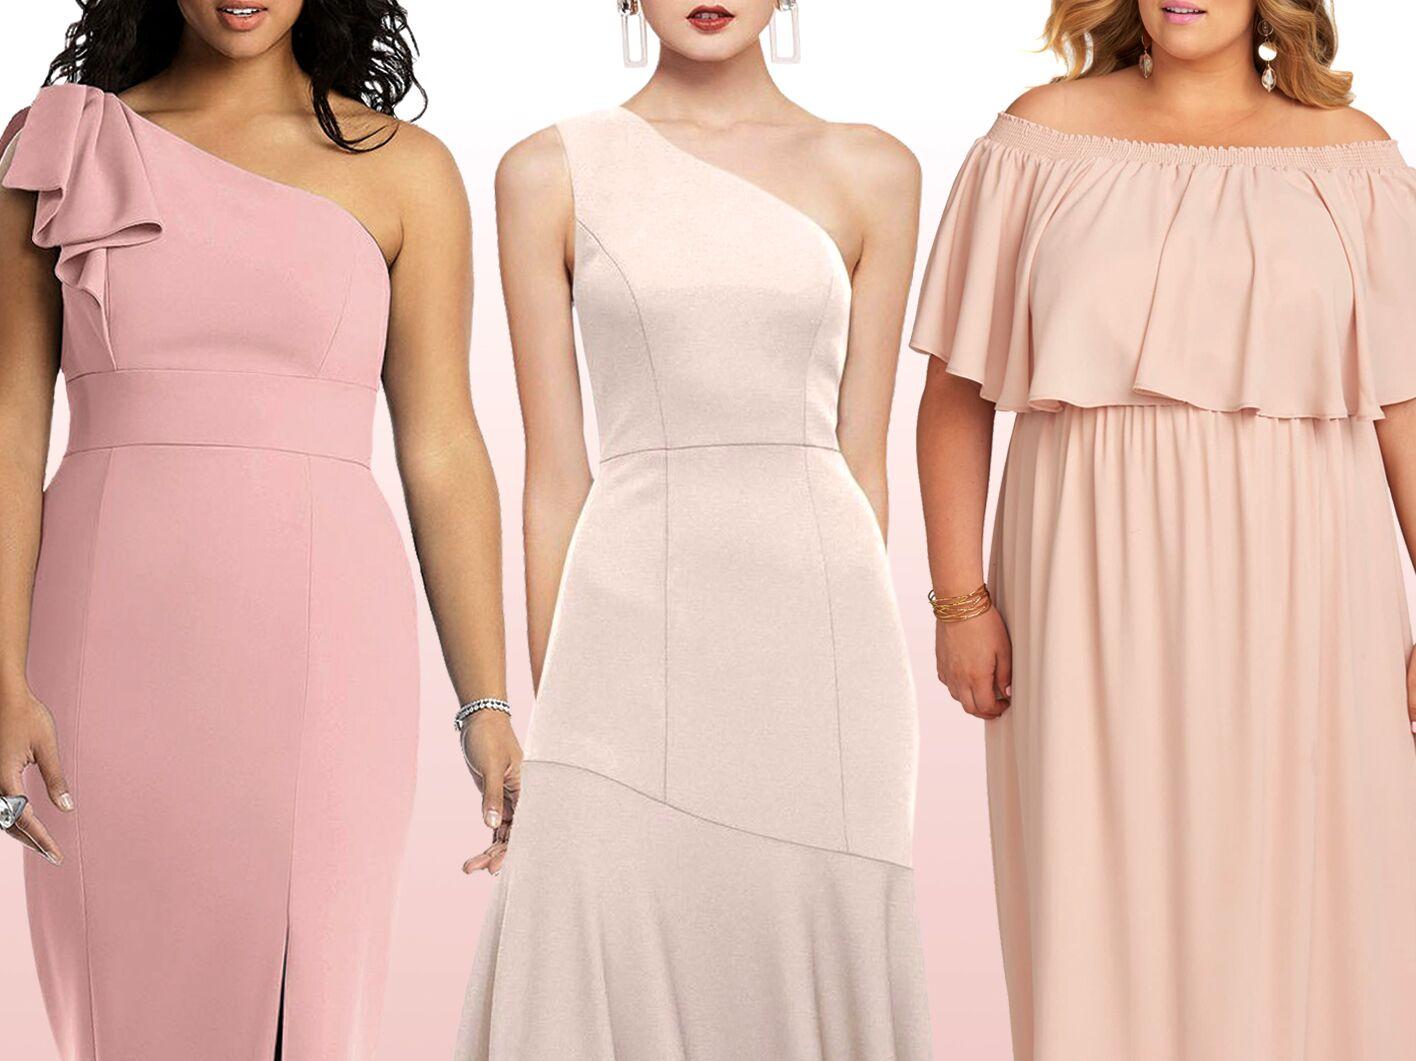 bridesmaid dresses pink